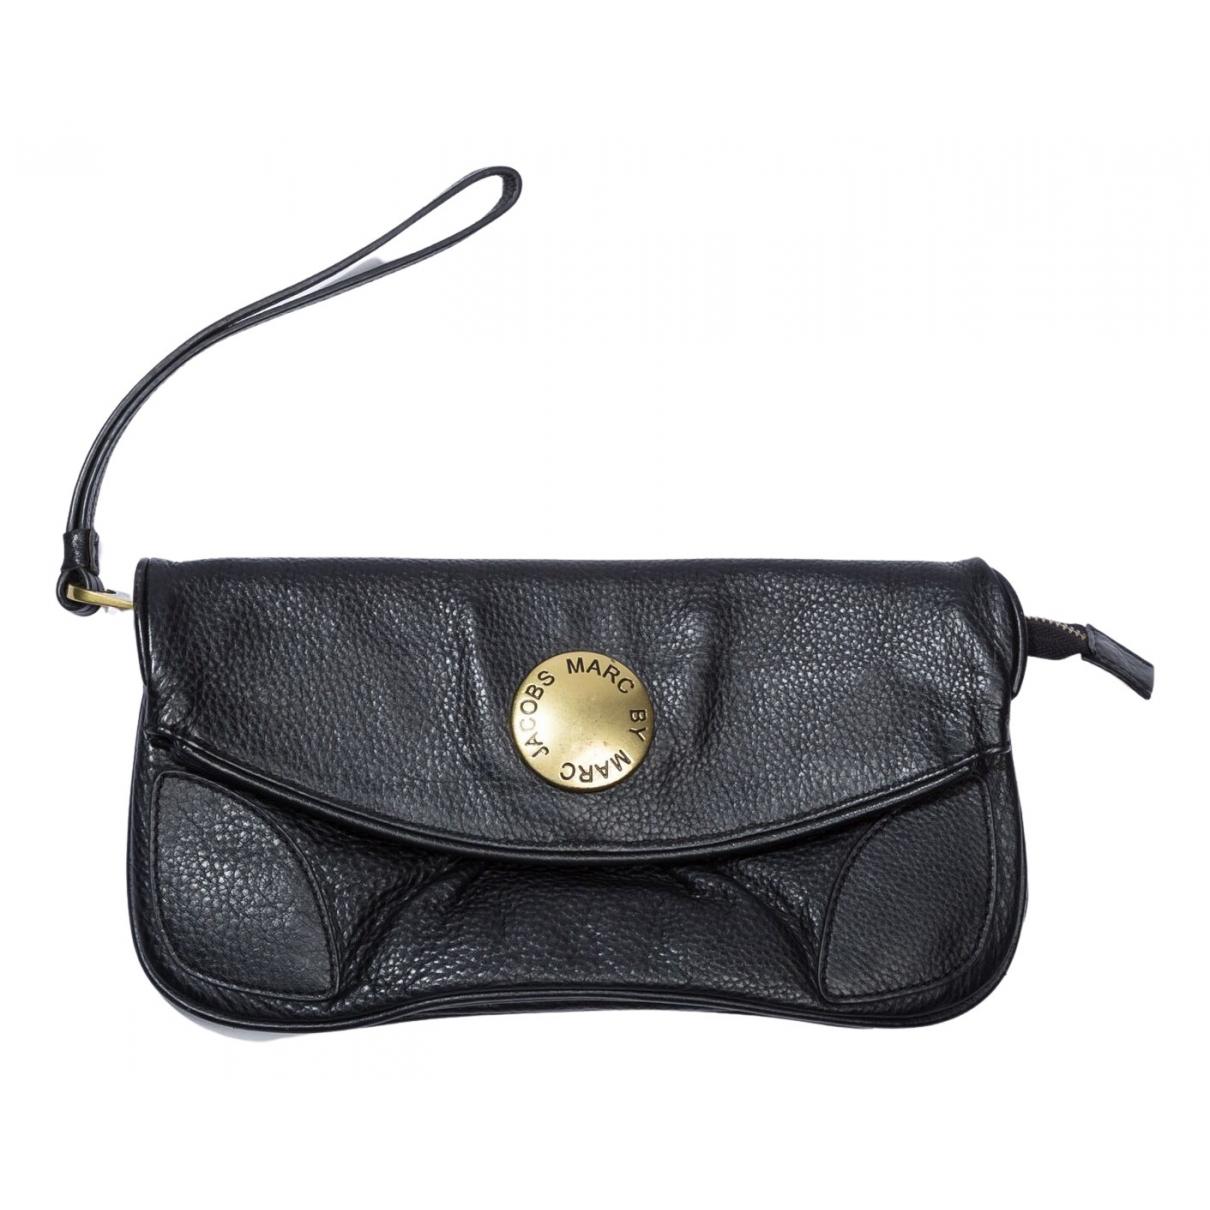 Marc By Marc Jacobs \N Black Clutch bag for Women \N